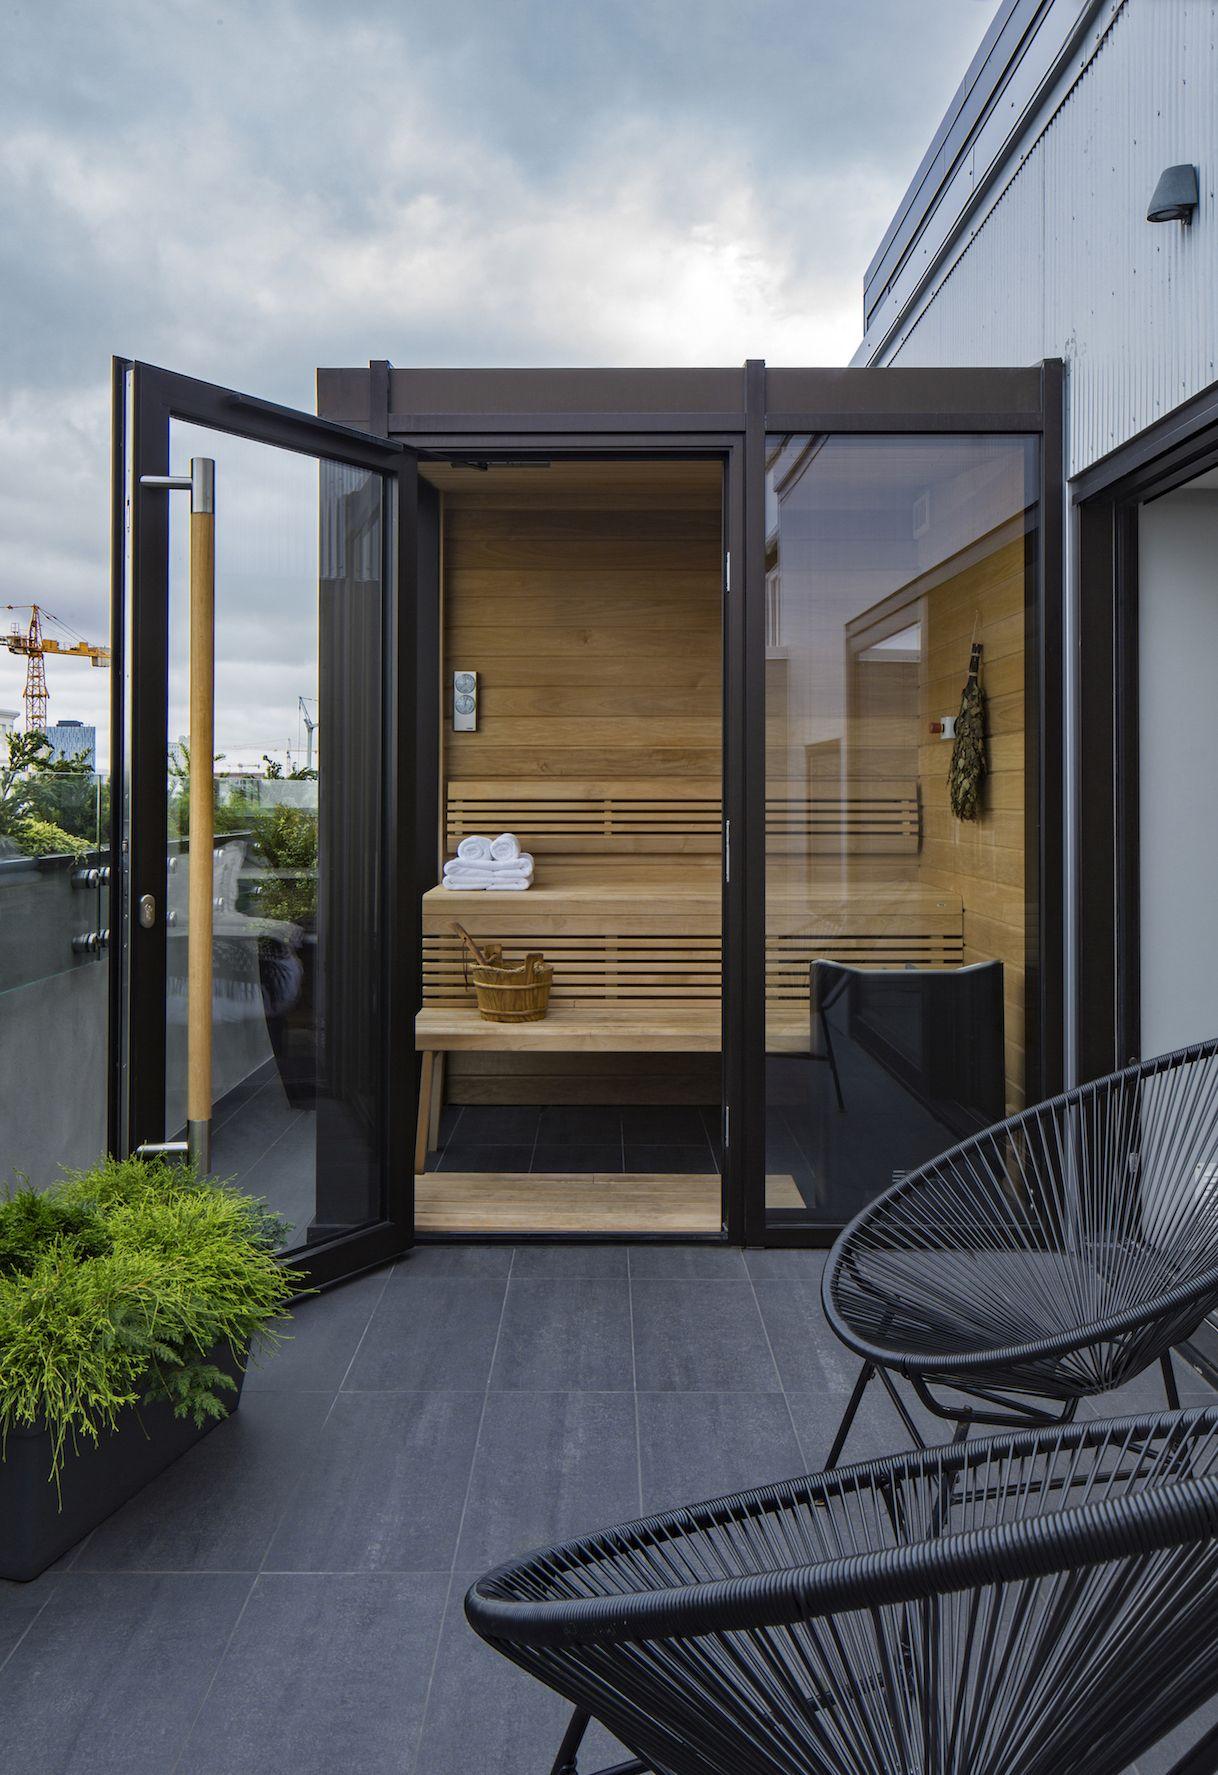 Nordic Charm Blends With Modern Design At The Ion City Hotel In Reykjavik Sauna Design Modern Saunas Outdoor Sauna